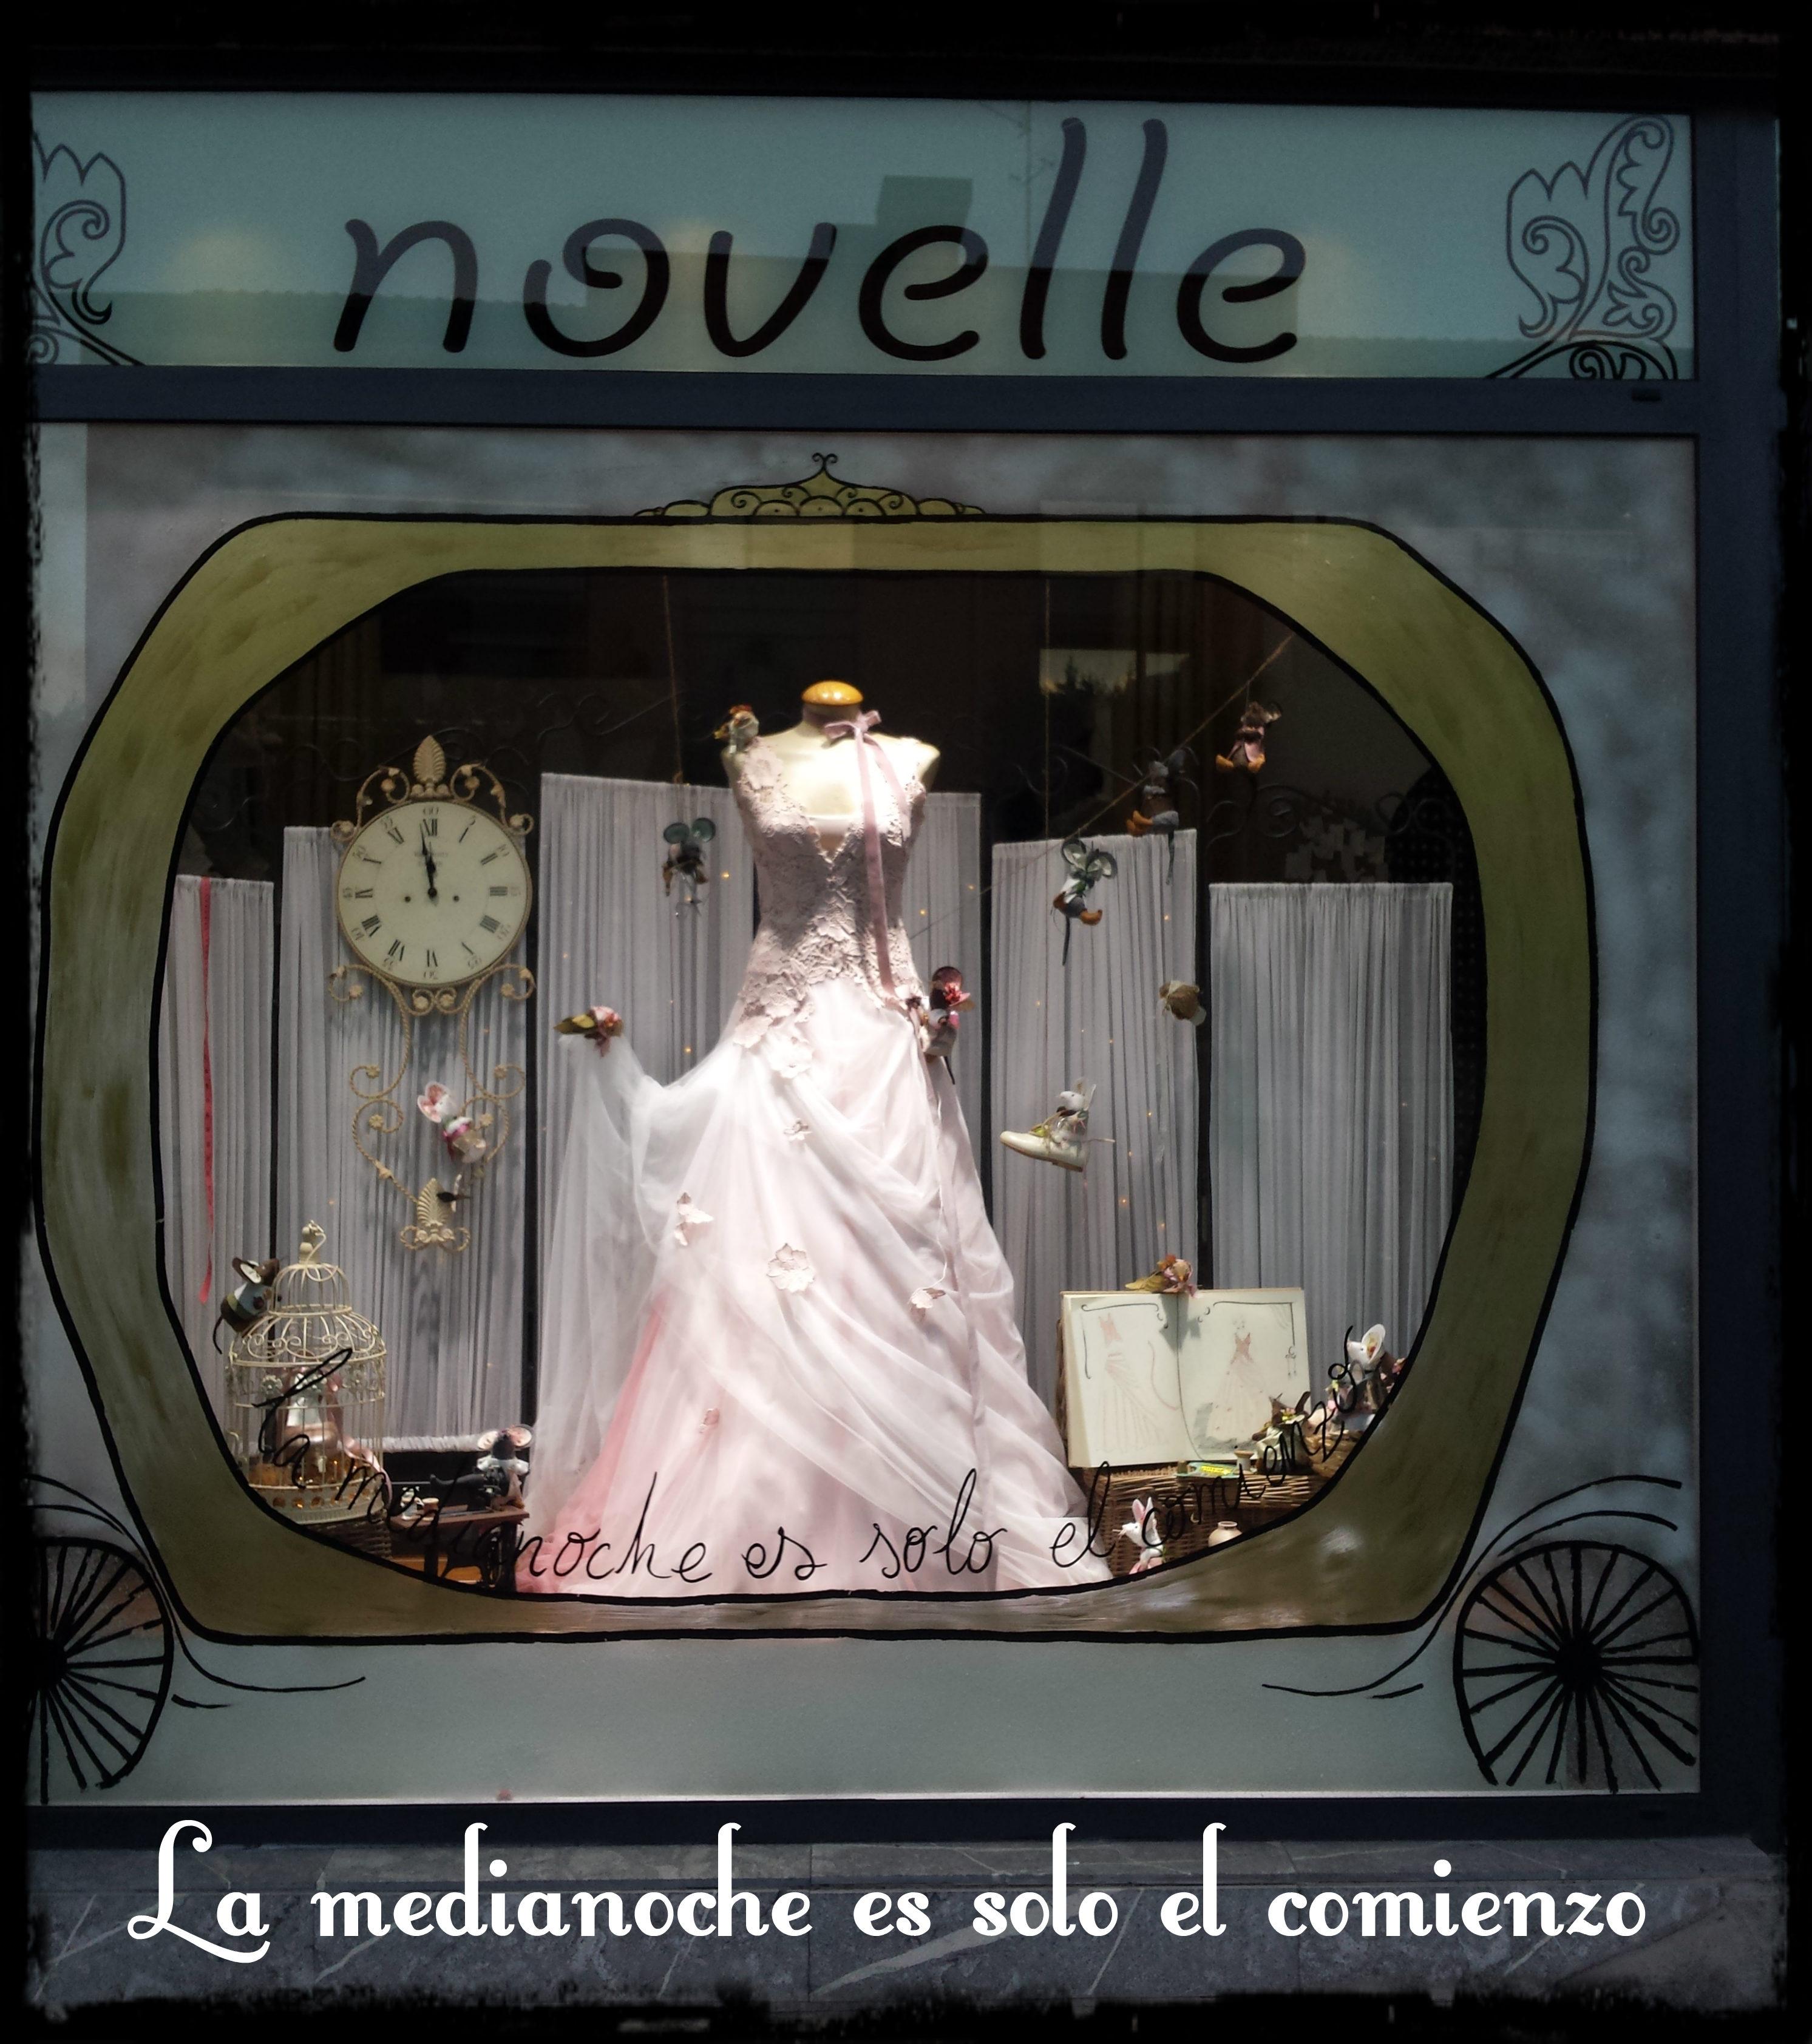 novelle-escaparate-navidad-2016-cenicienta-13